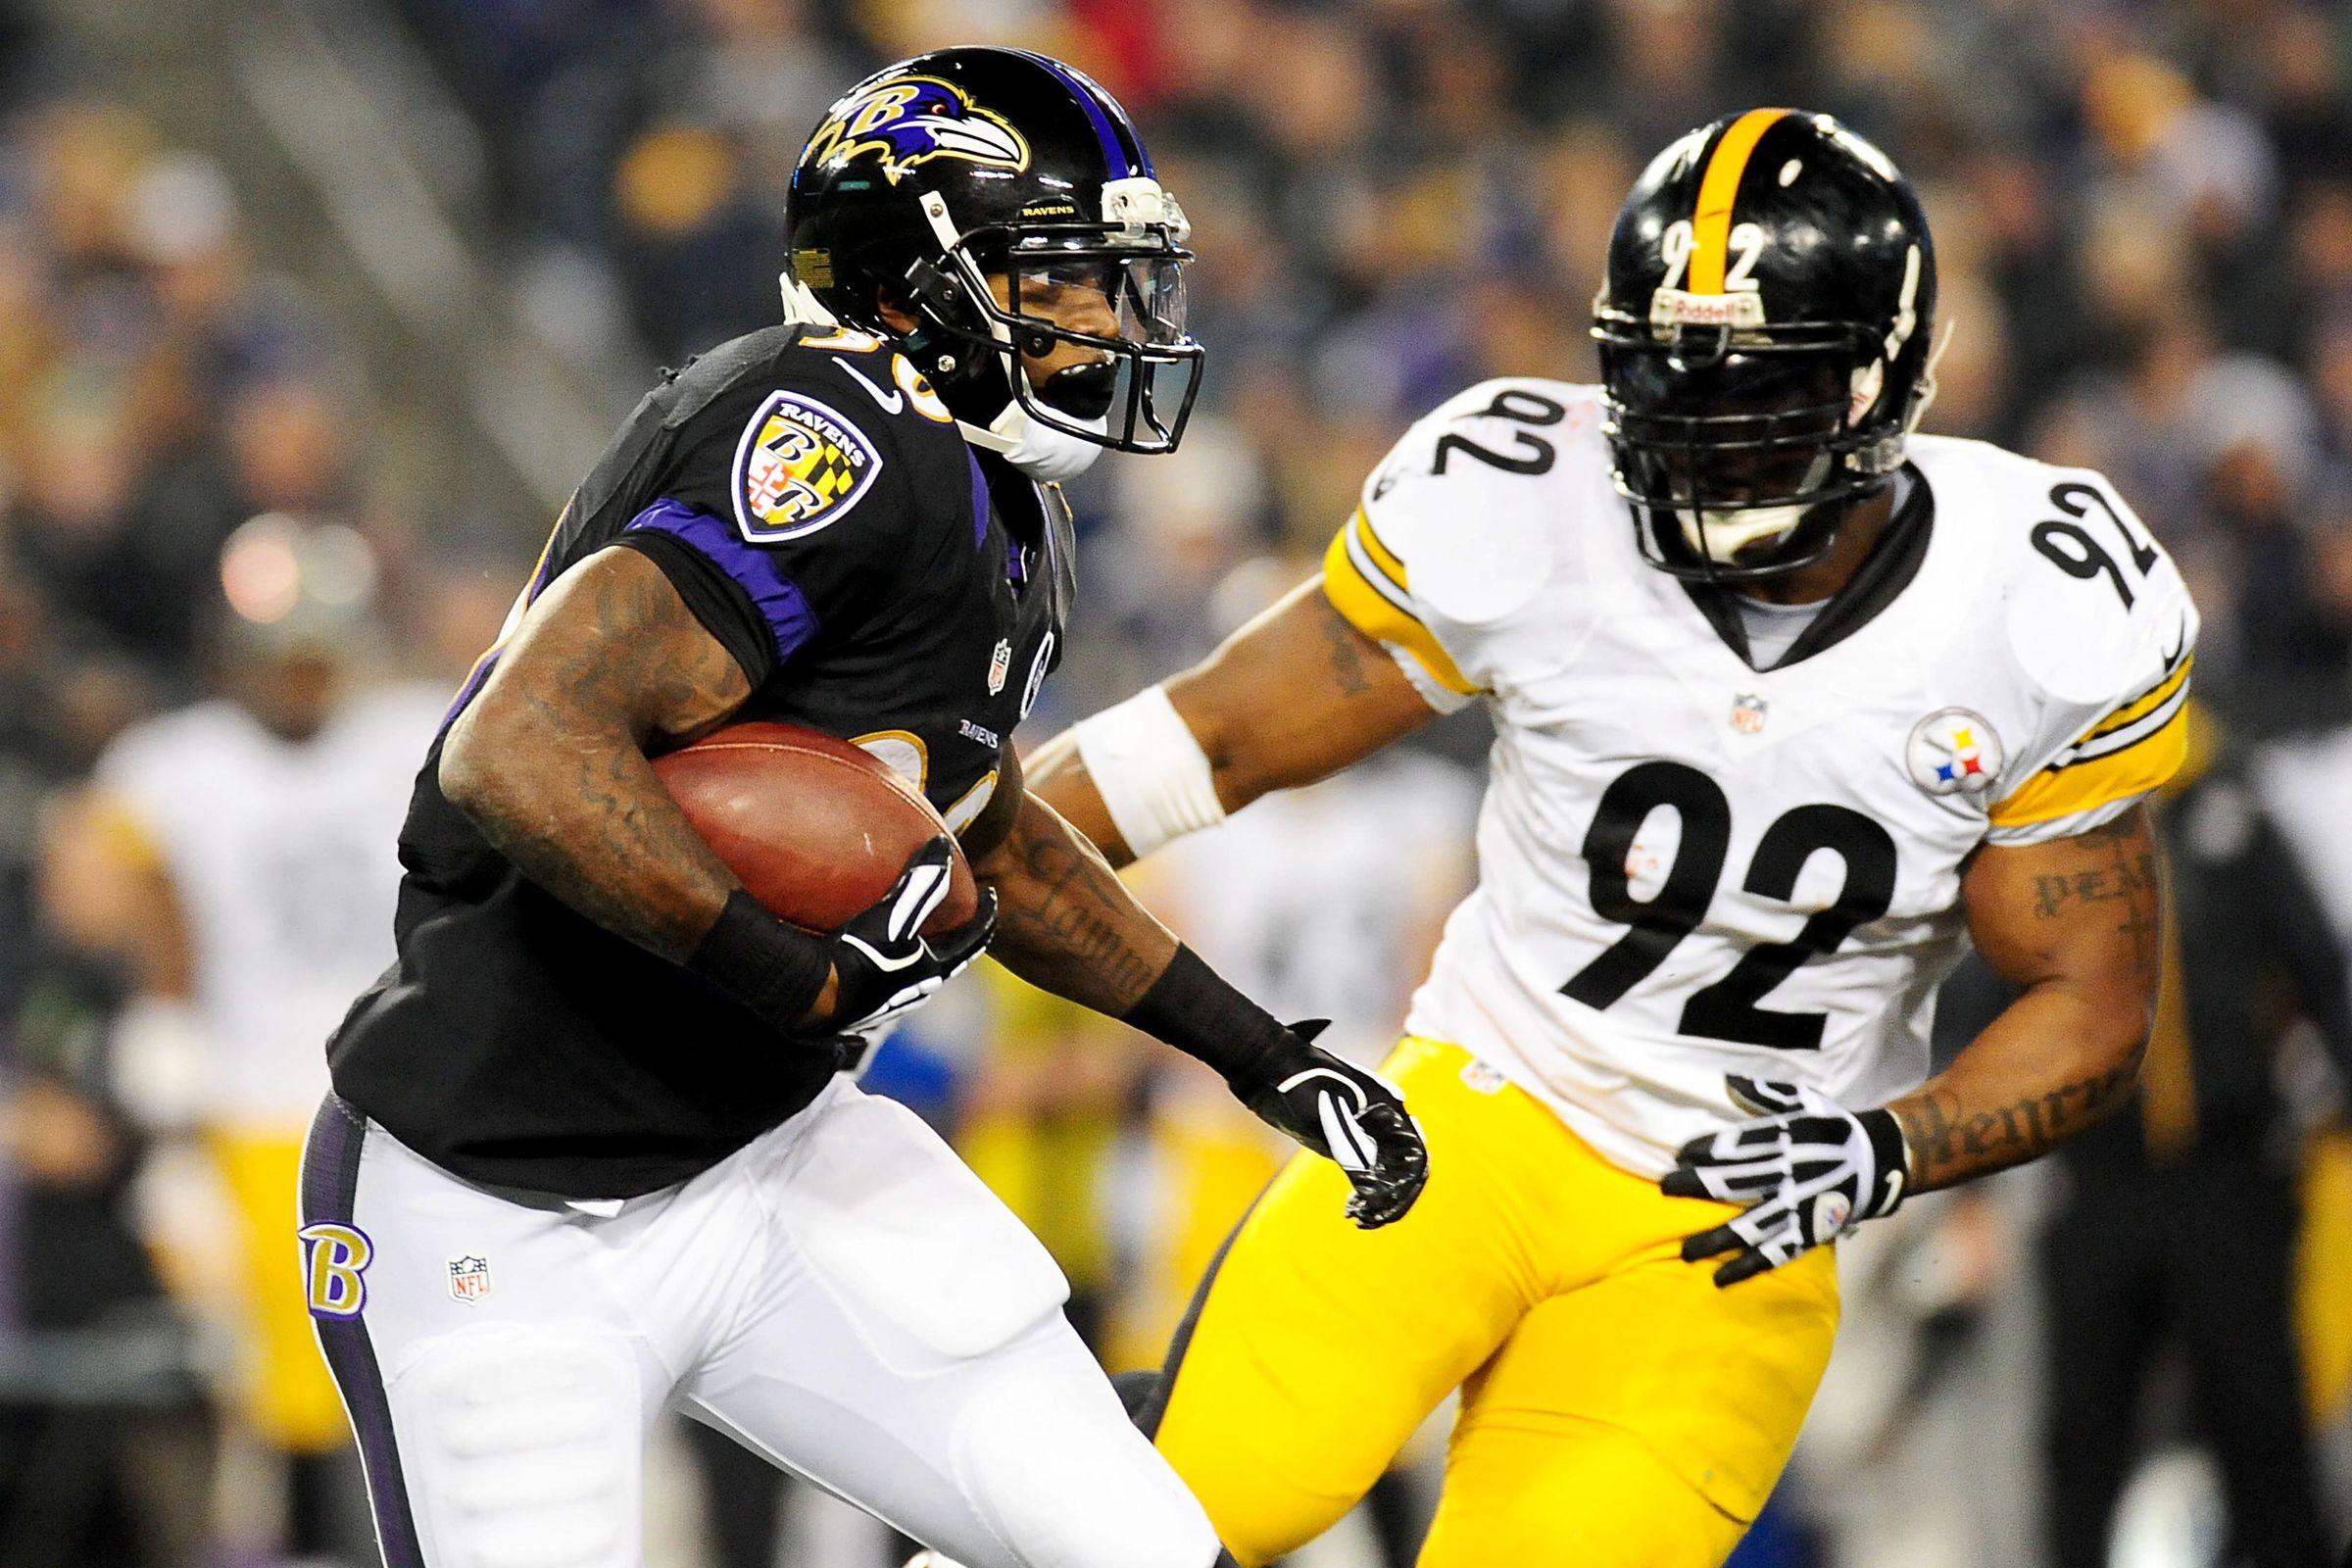 … Pittsburgh Steelers NFL Desktop Backgrounds 2 …